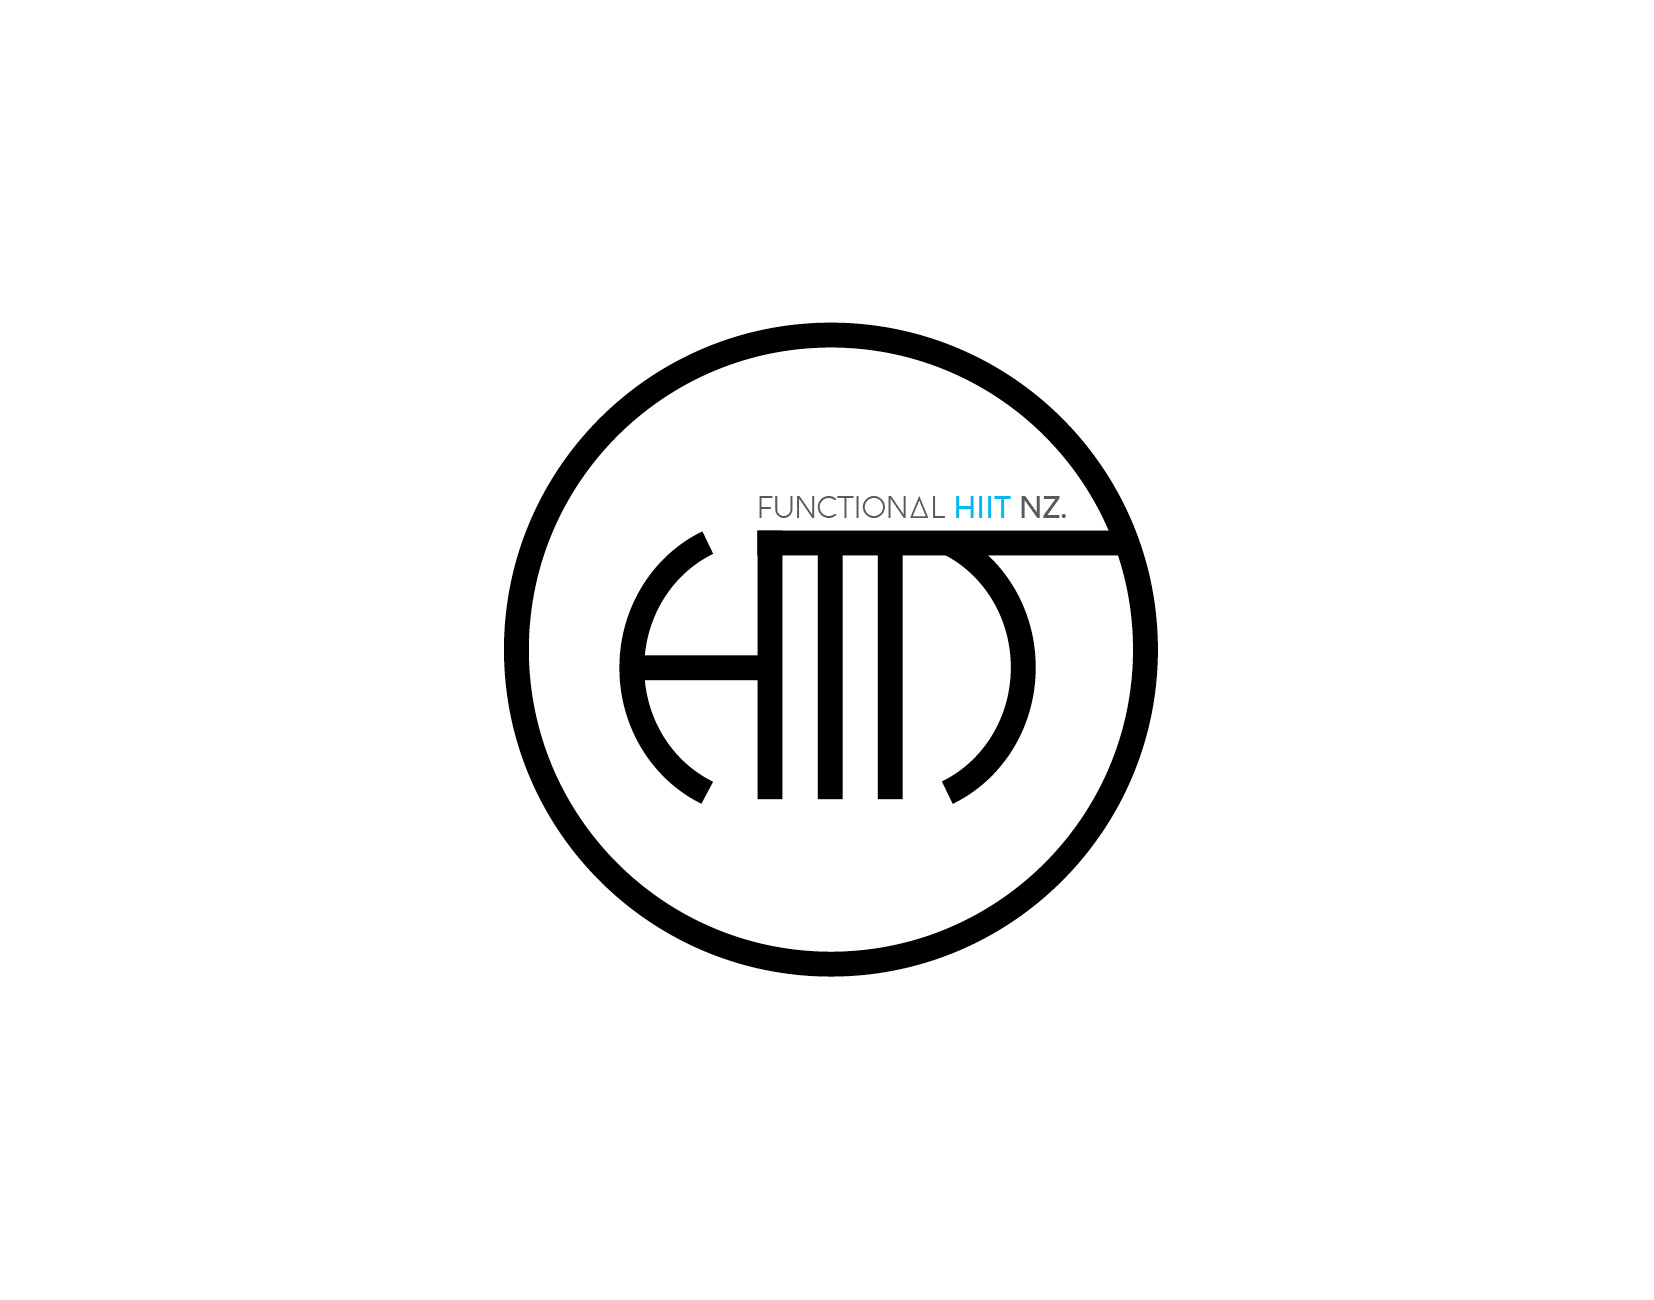 HIIT Logos3.jpg